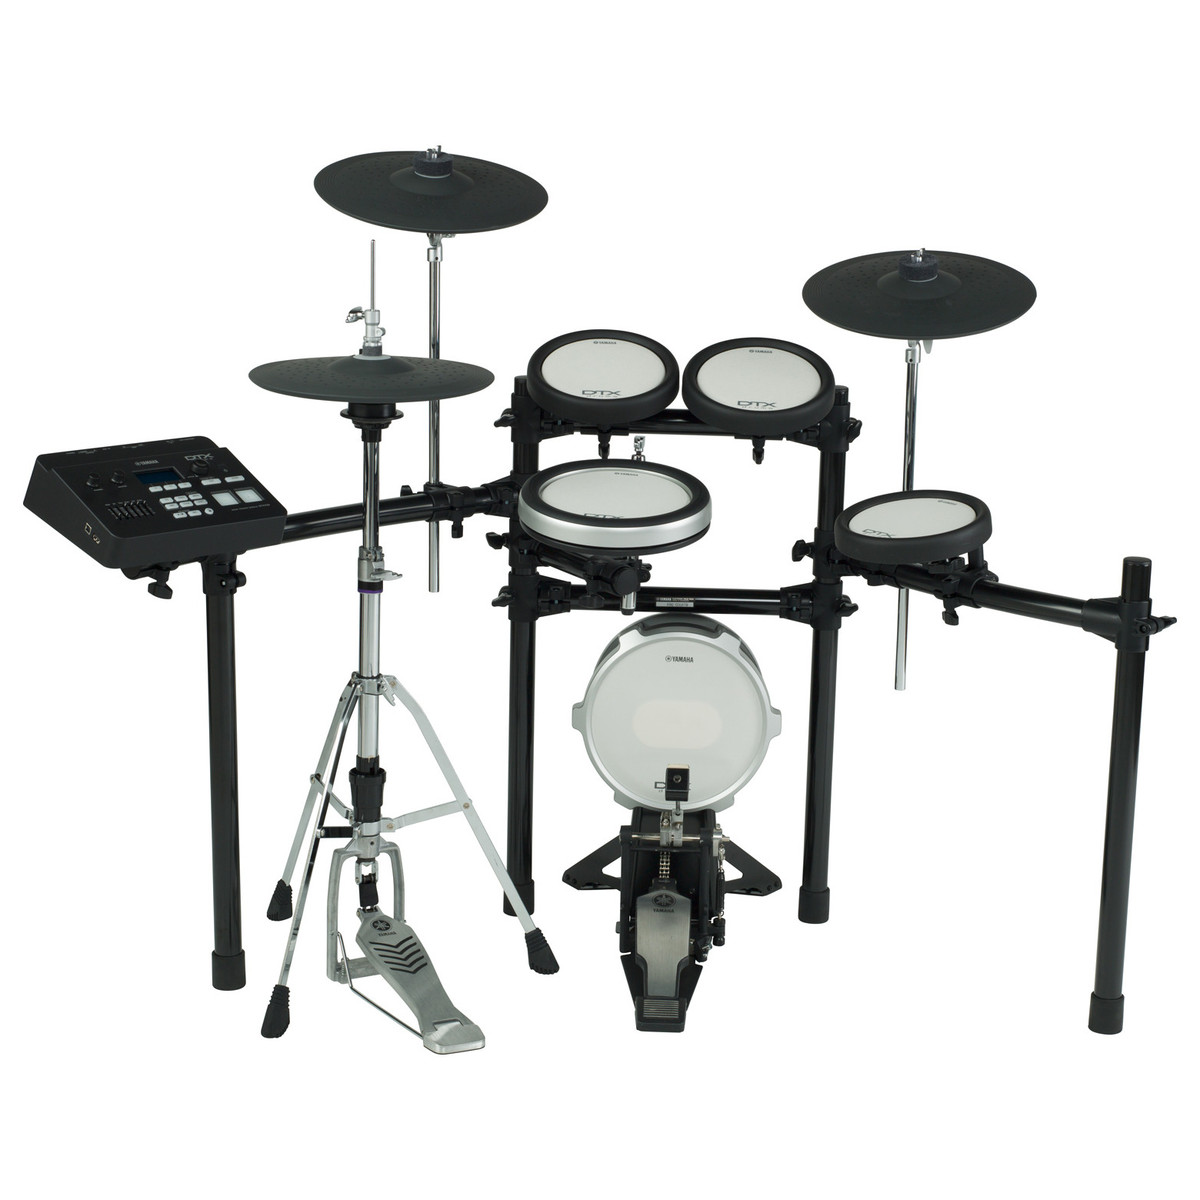 Yamaha dtx720k electronic drum kit at for Yamaha dtx 700